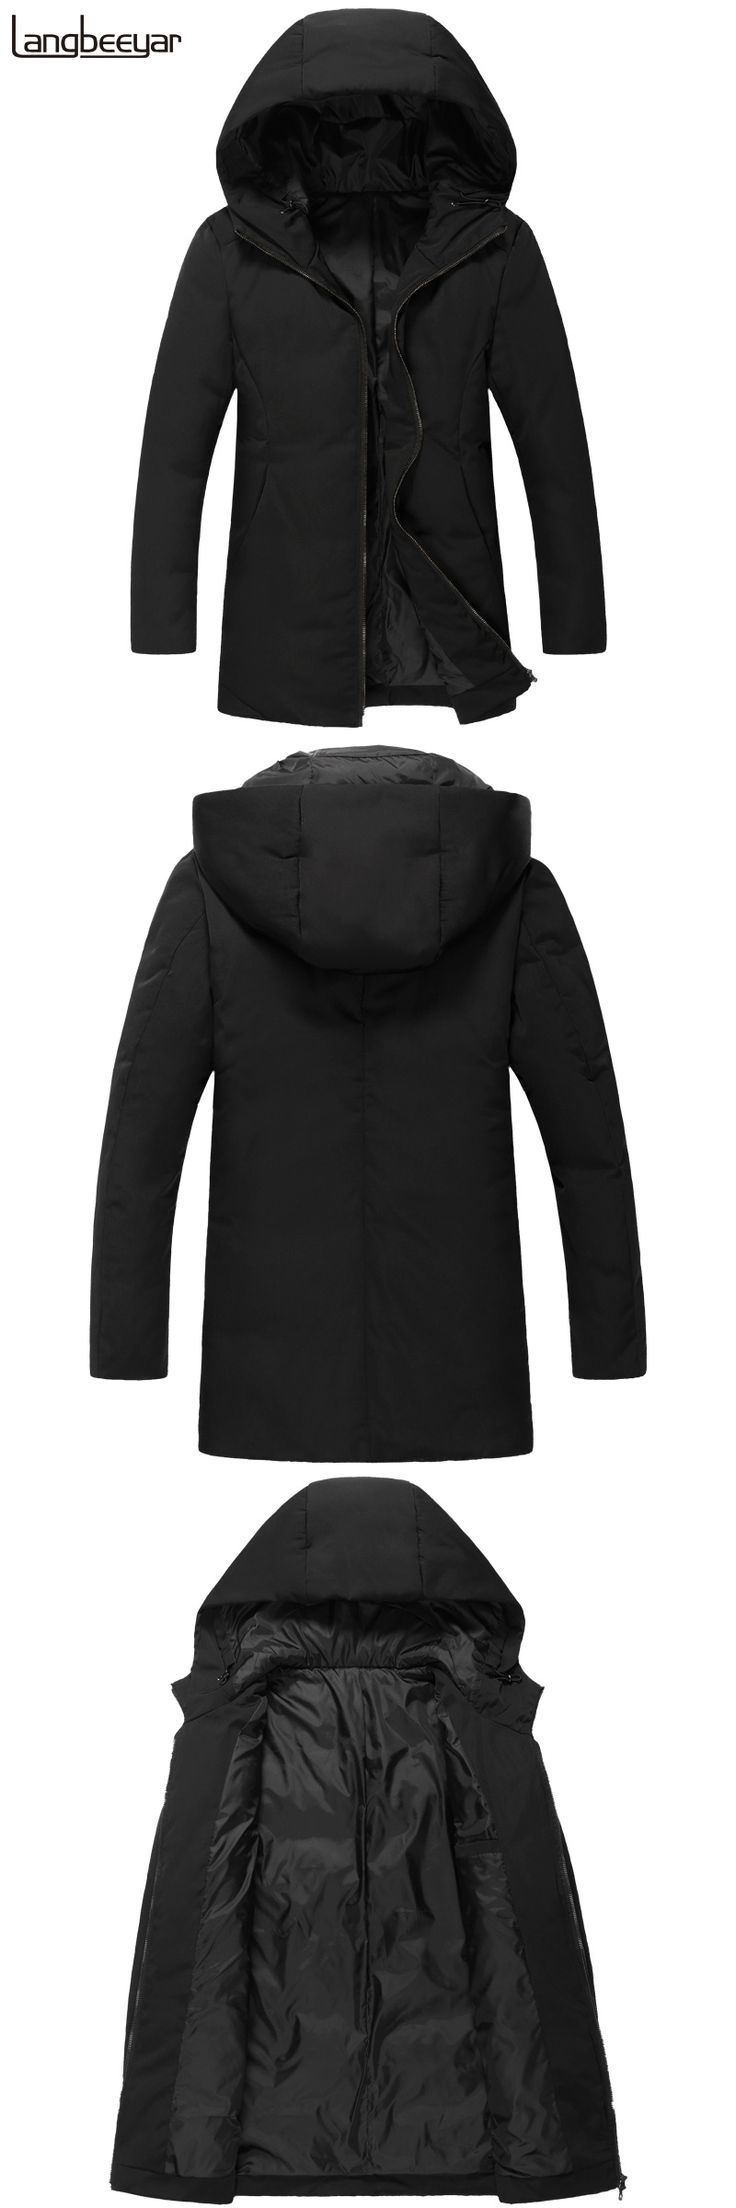 New Fashion Brand Clothing Mens Duck Down Jackets Mens Top Grade Winter Jacket Men Parka Trend Hooded Men Winter Coat Men